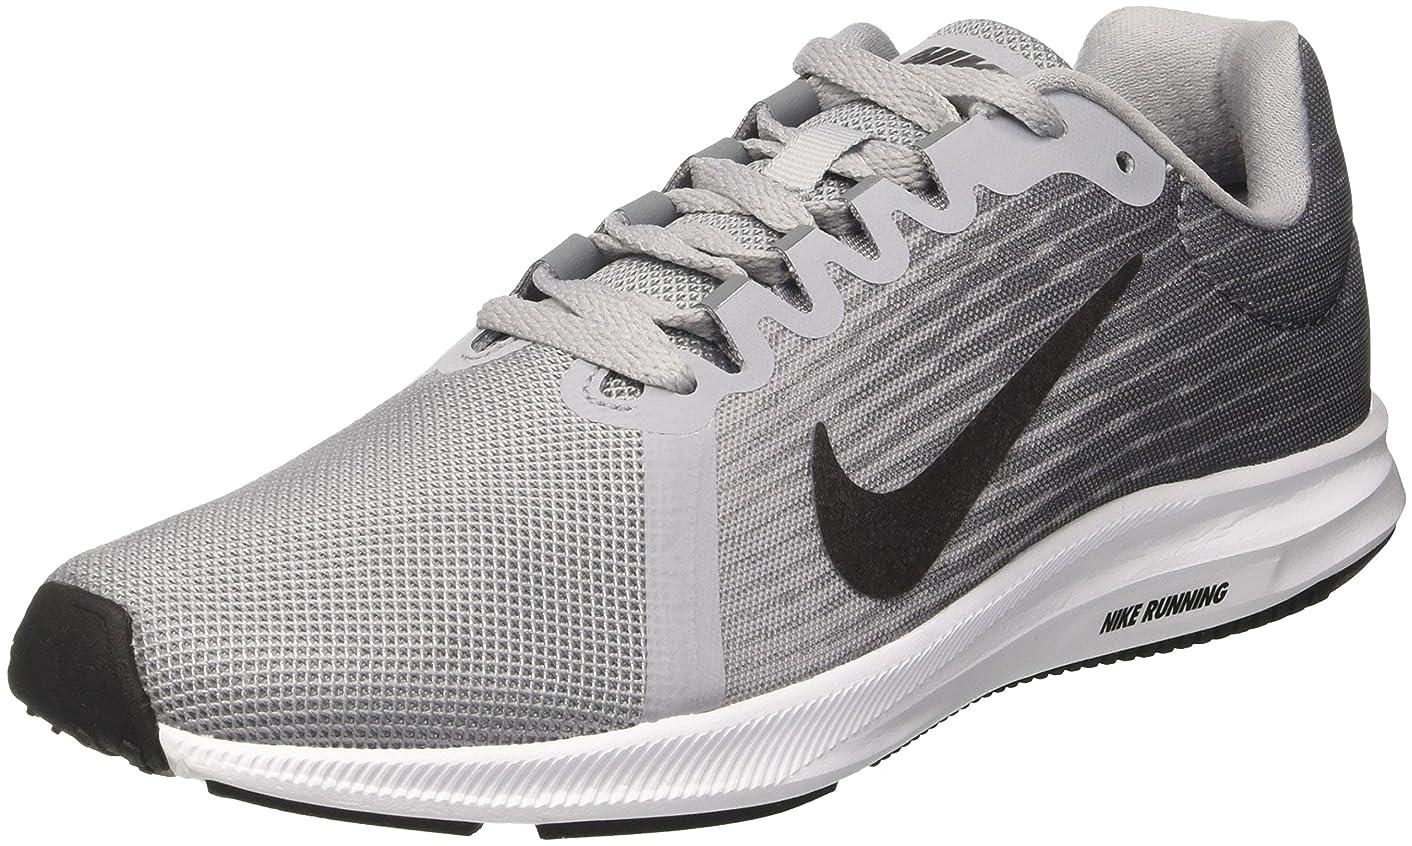 Nike Women's Downshifter 8 Running Shoe, Wolf Metallic Dark Cool Grey, 10.5 Regular US